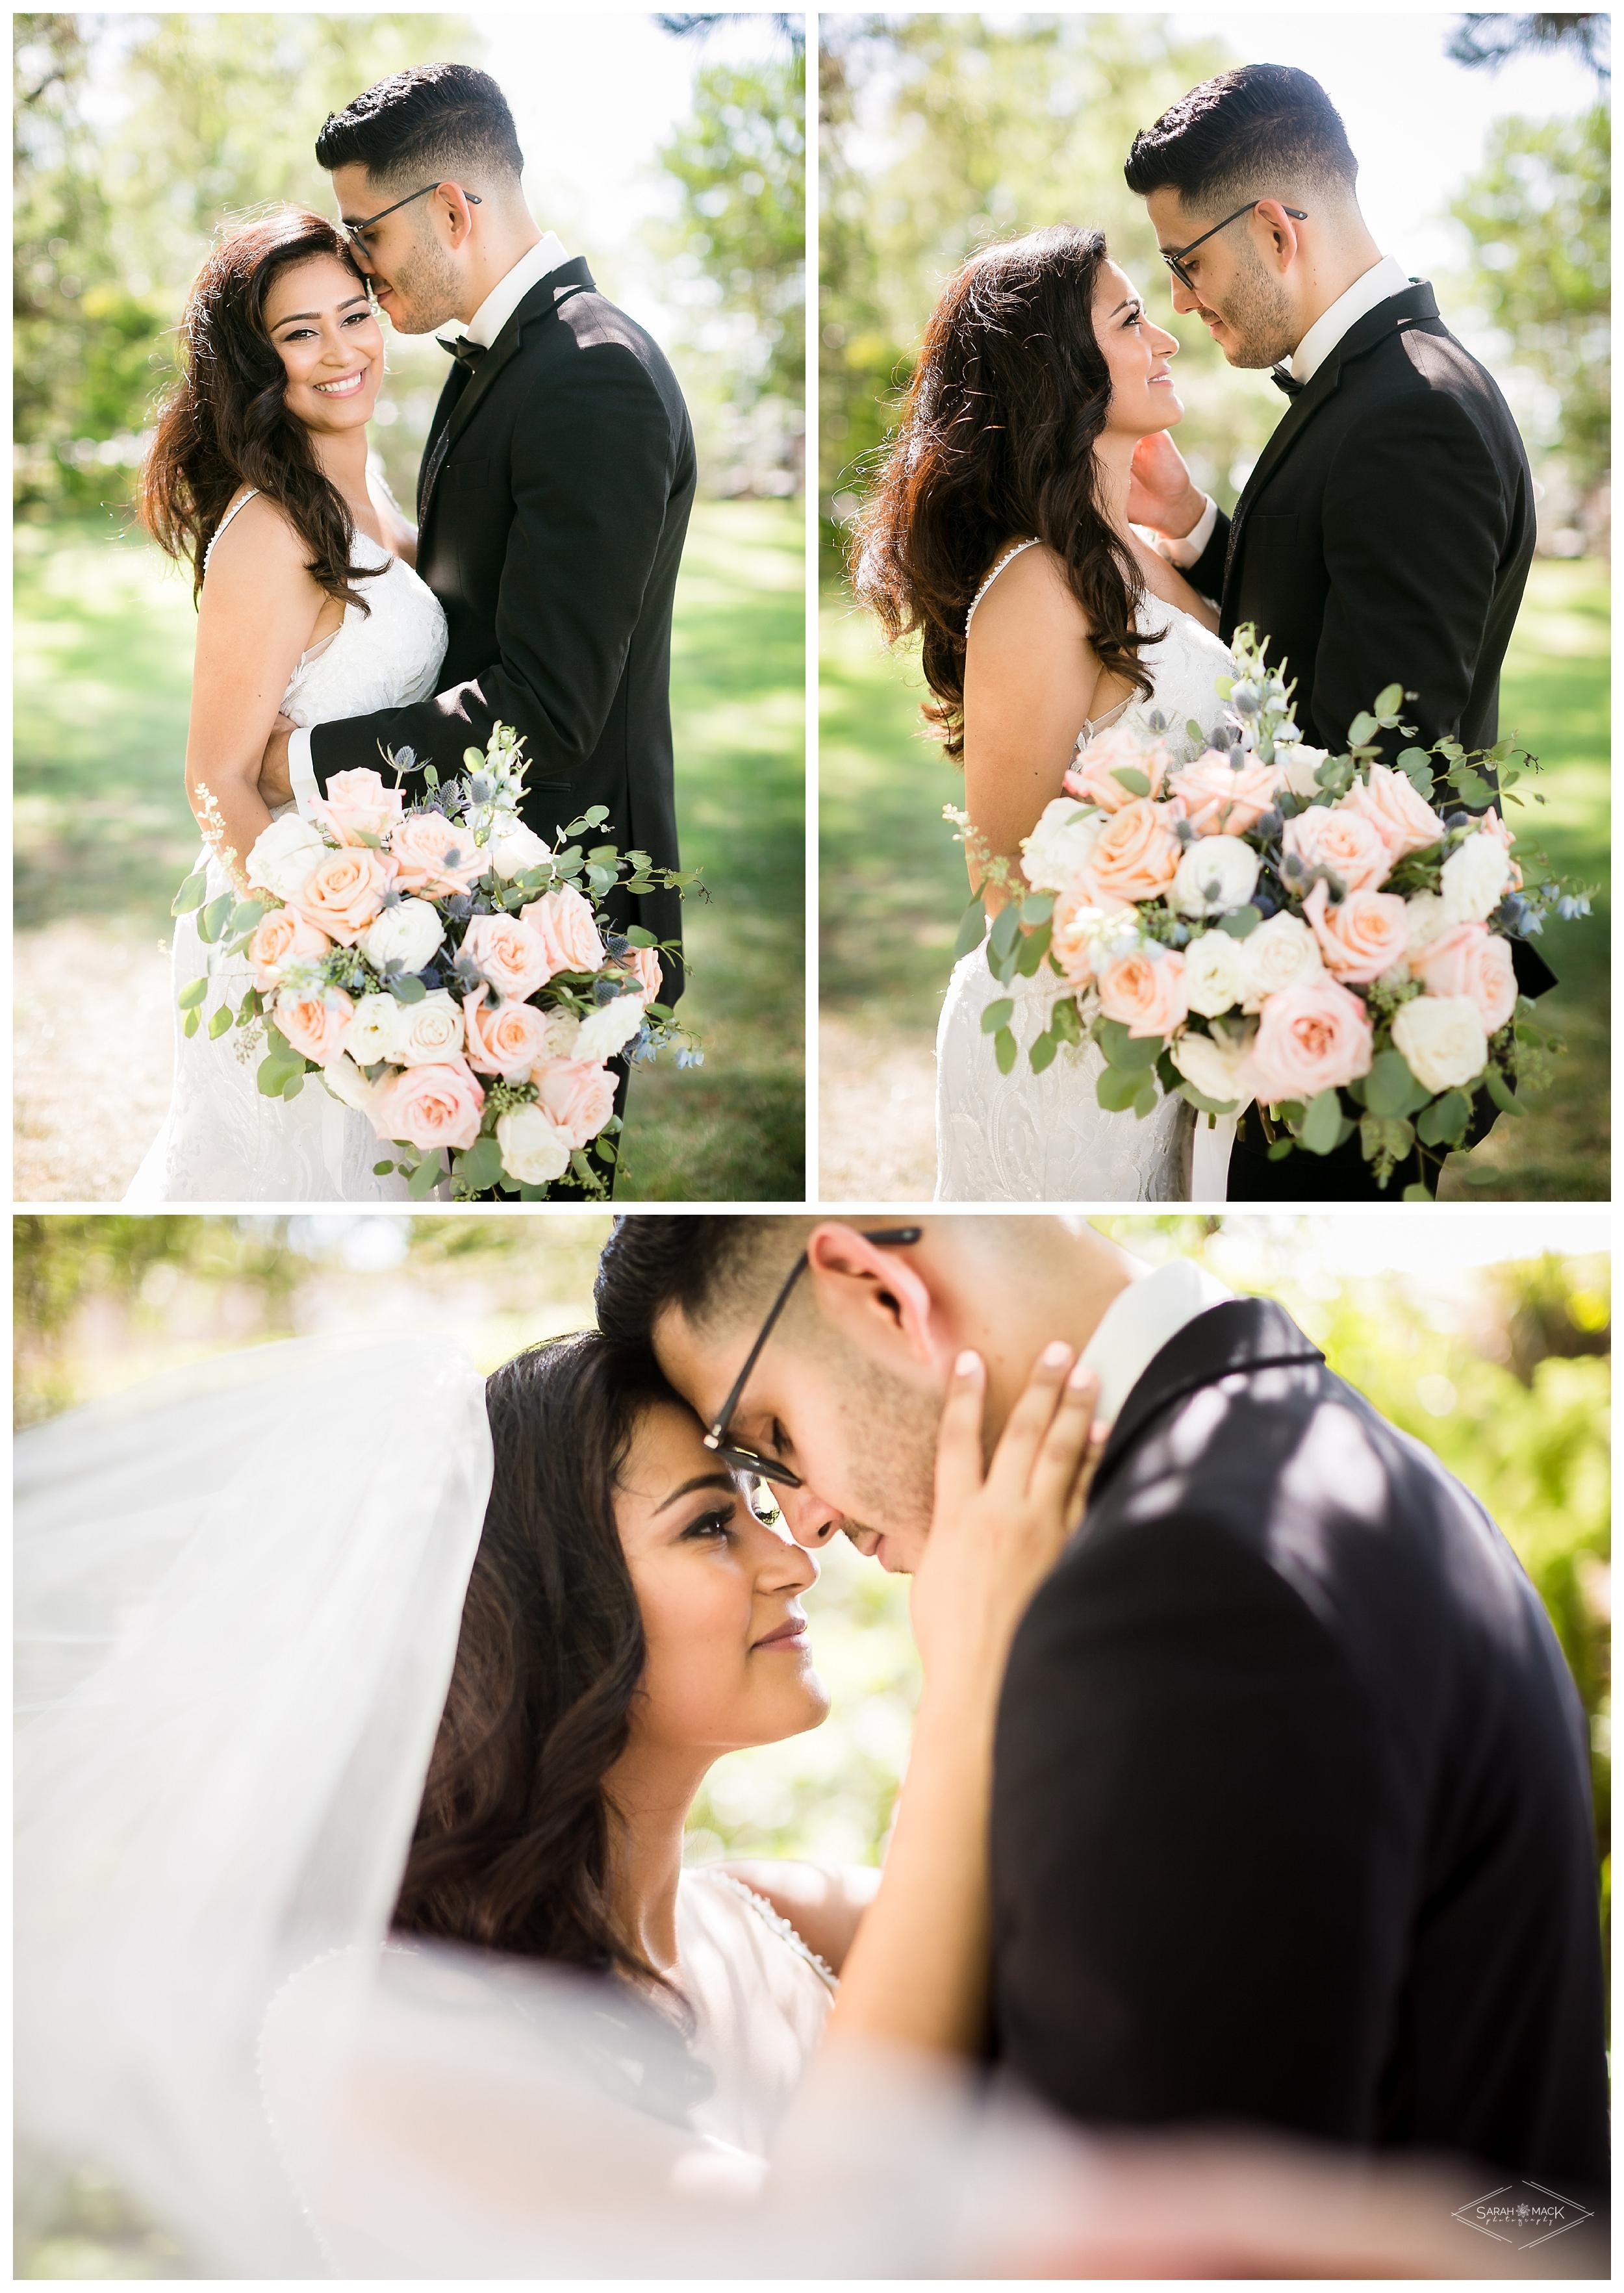 IA-Alta-Vista-Country-Club-Yorba-Linda-Wedding-Photography 263.jpg